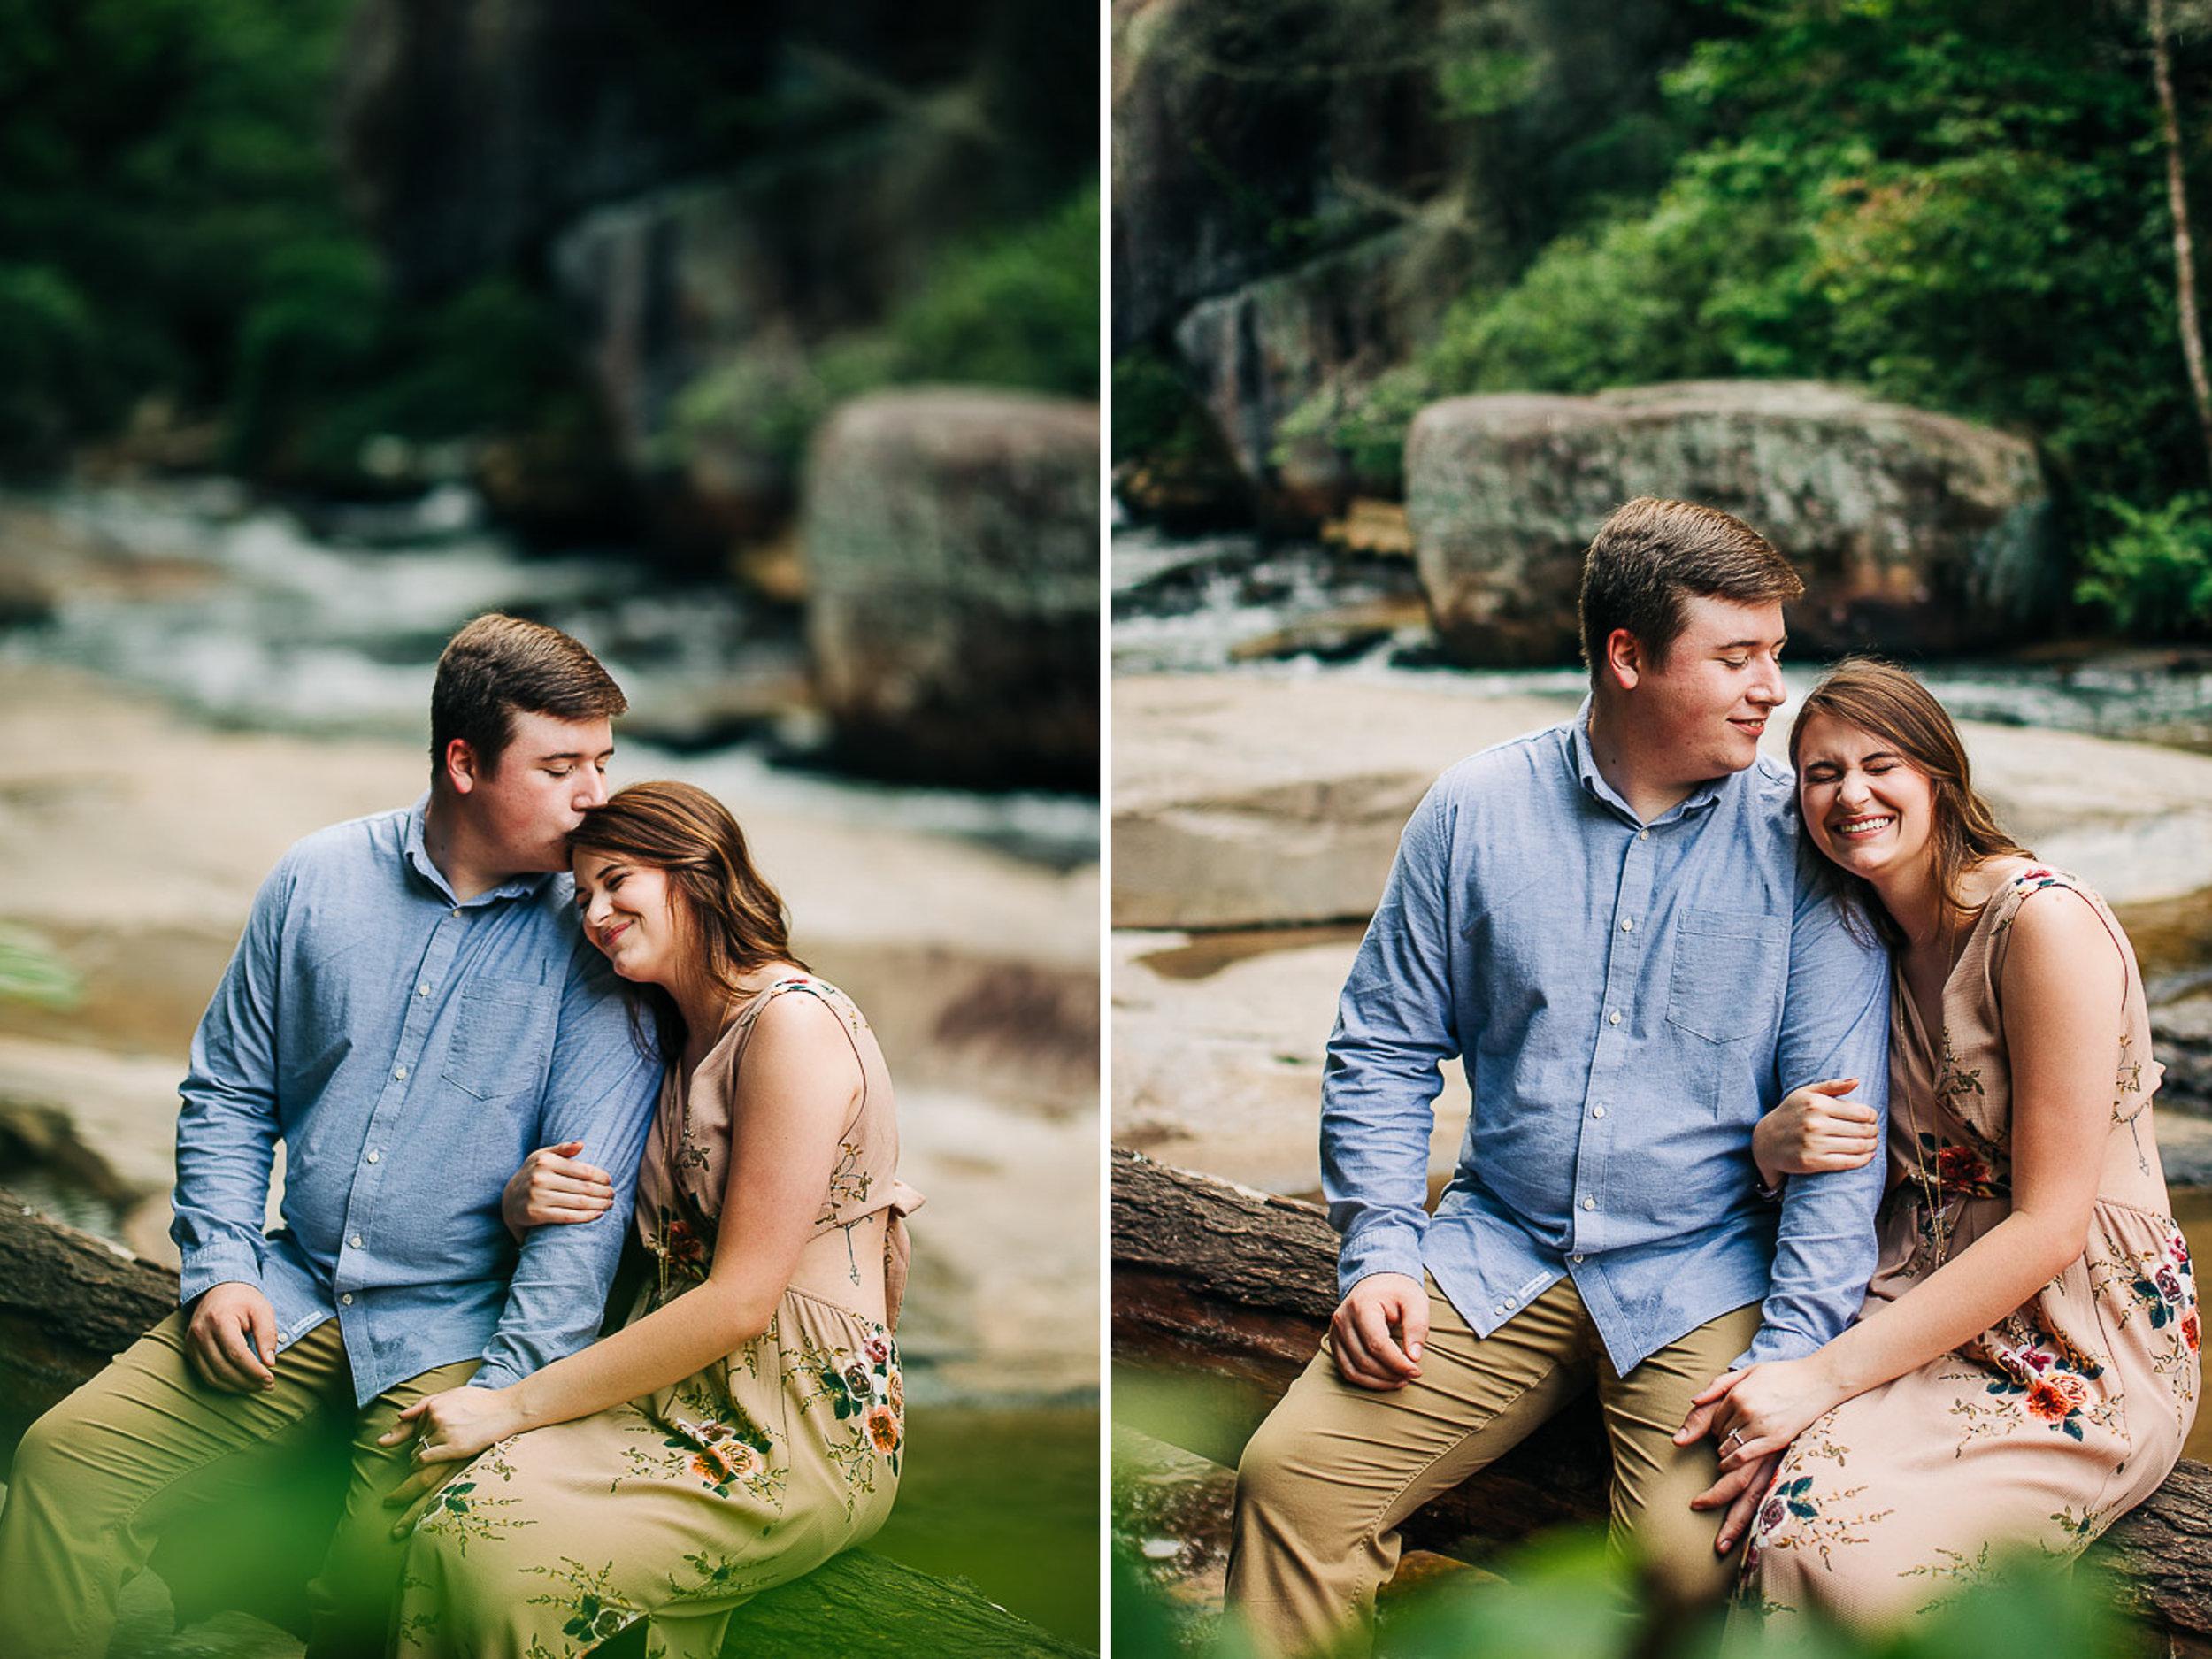 River Engagement Portraits, Summer Engagement Portraits, Engaged, South Carolina 04.jpg